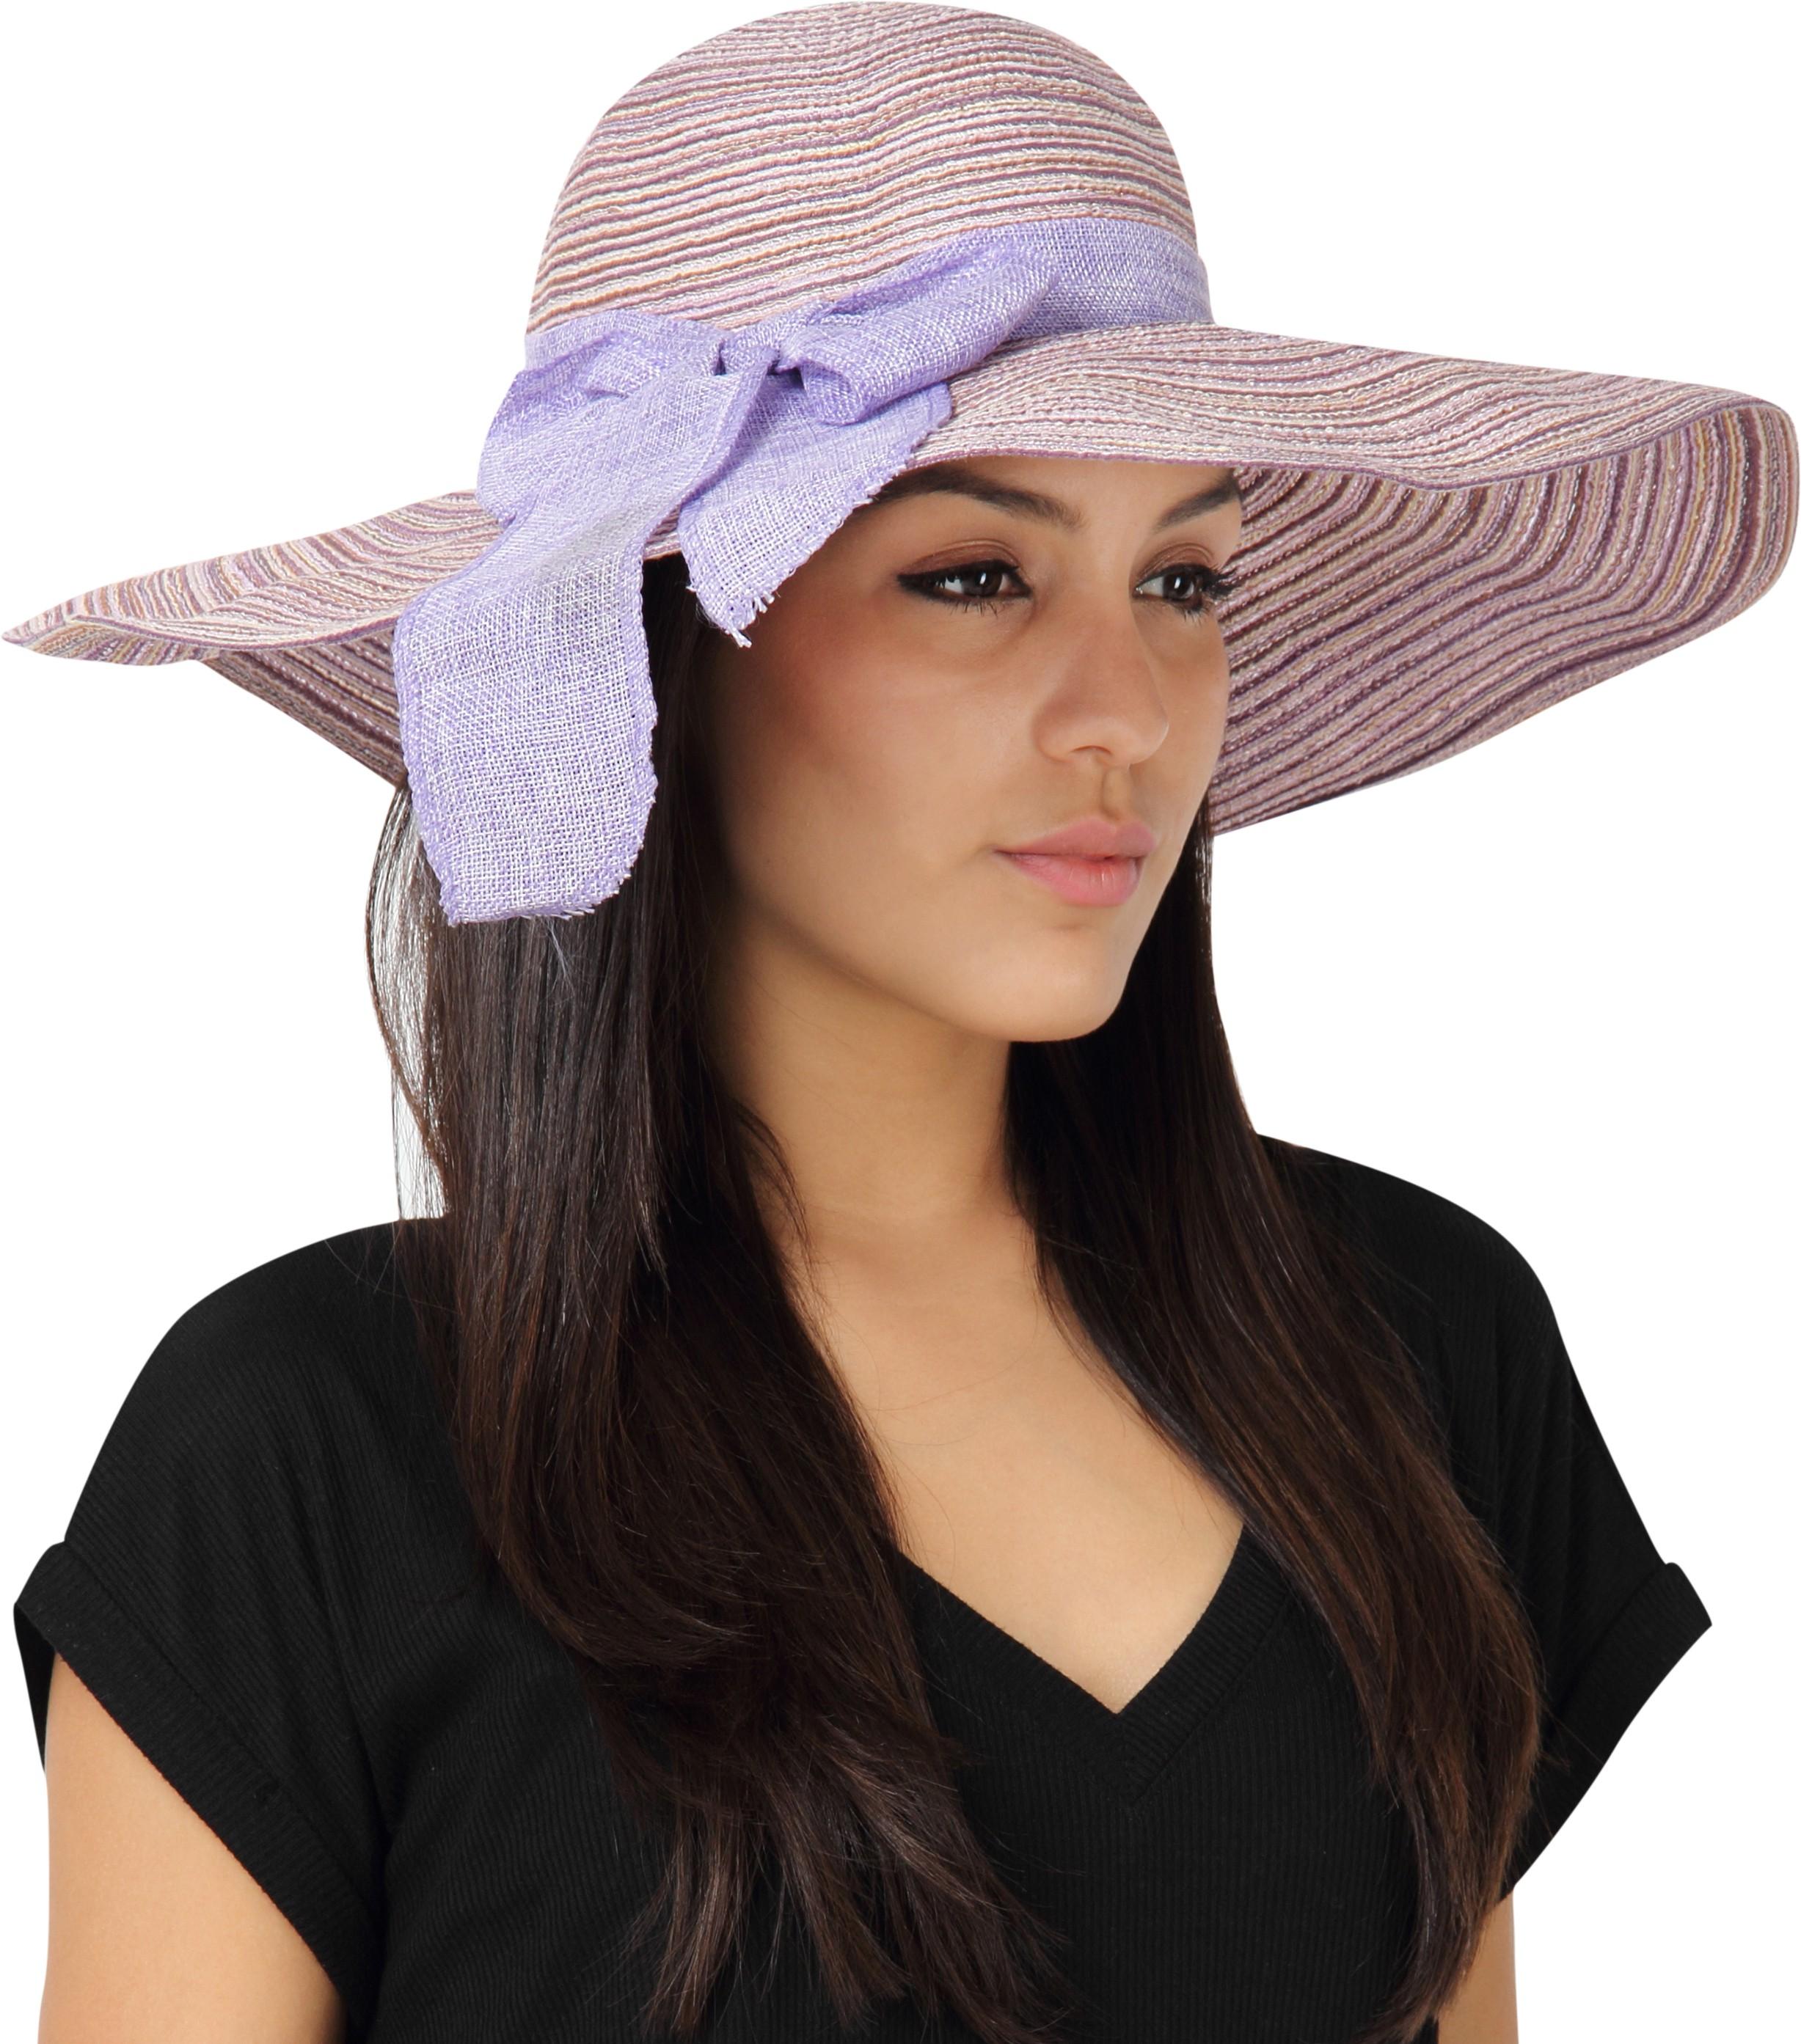 e9abf6e90b4 FabSeasons Long Brim Beach Hat Cap